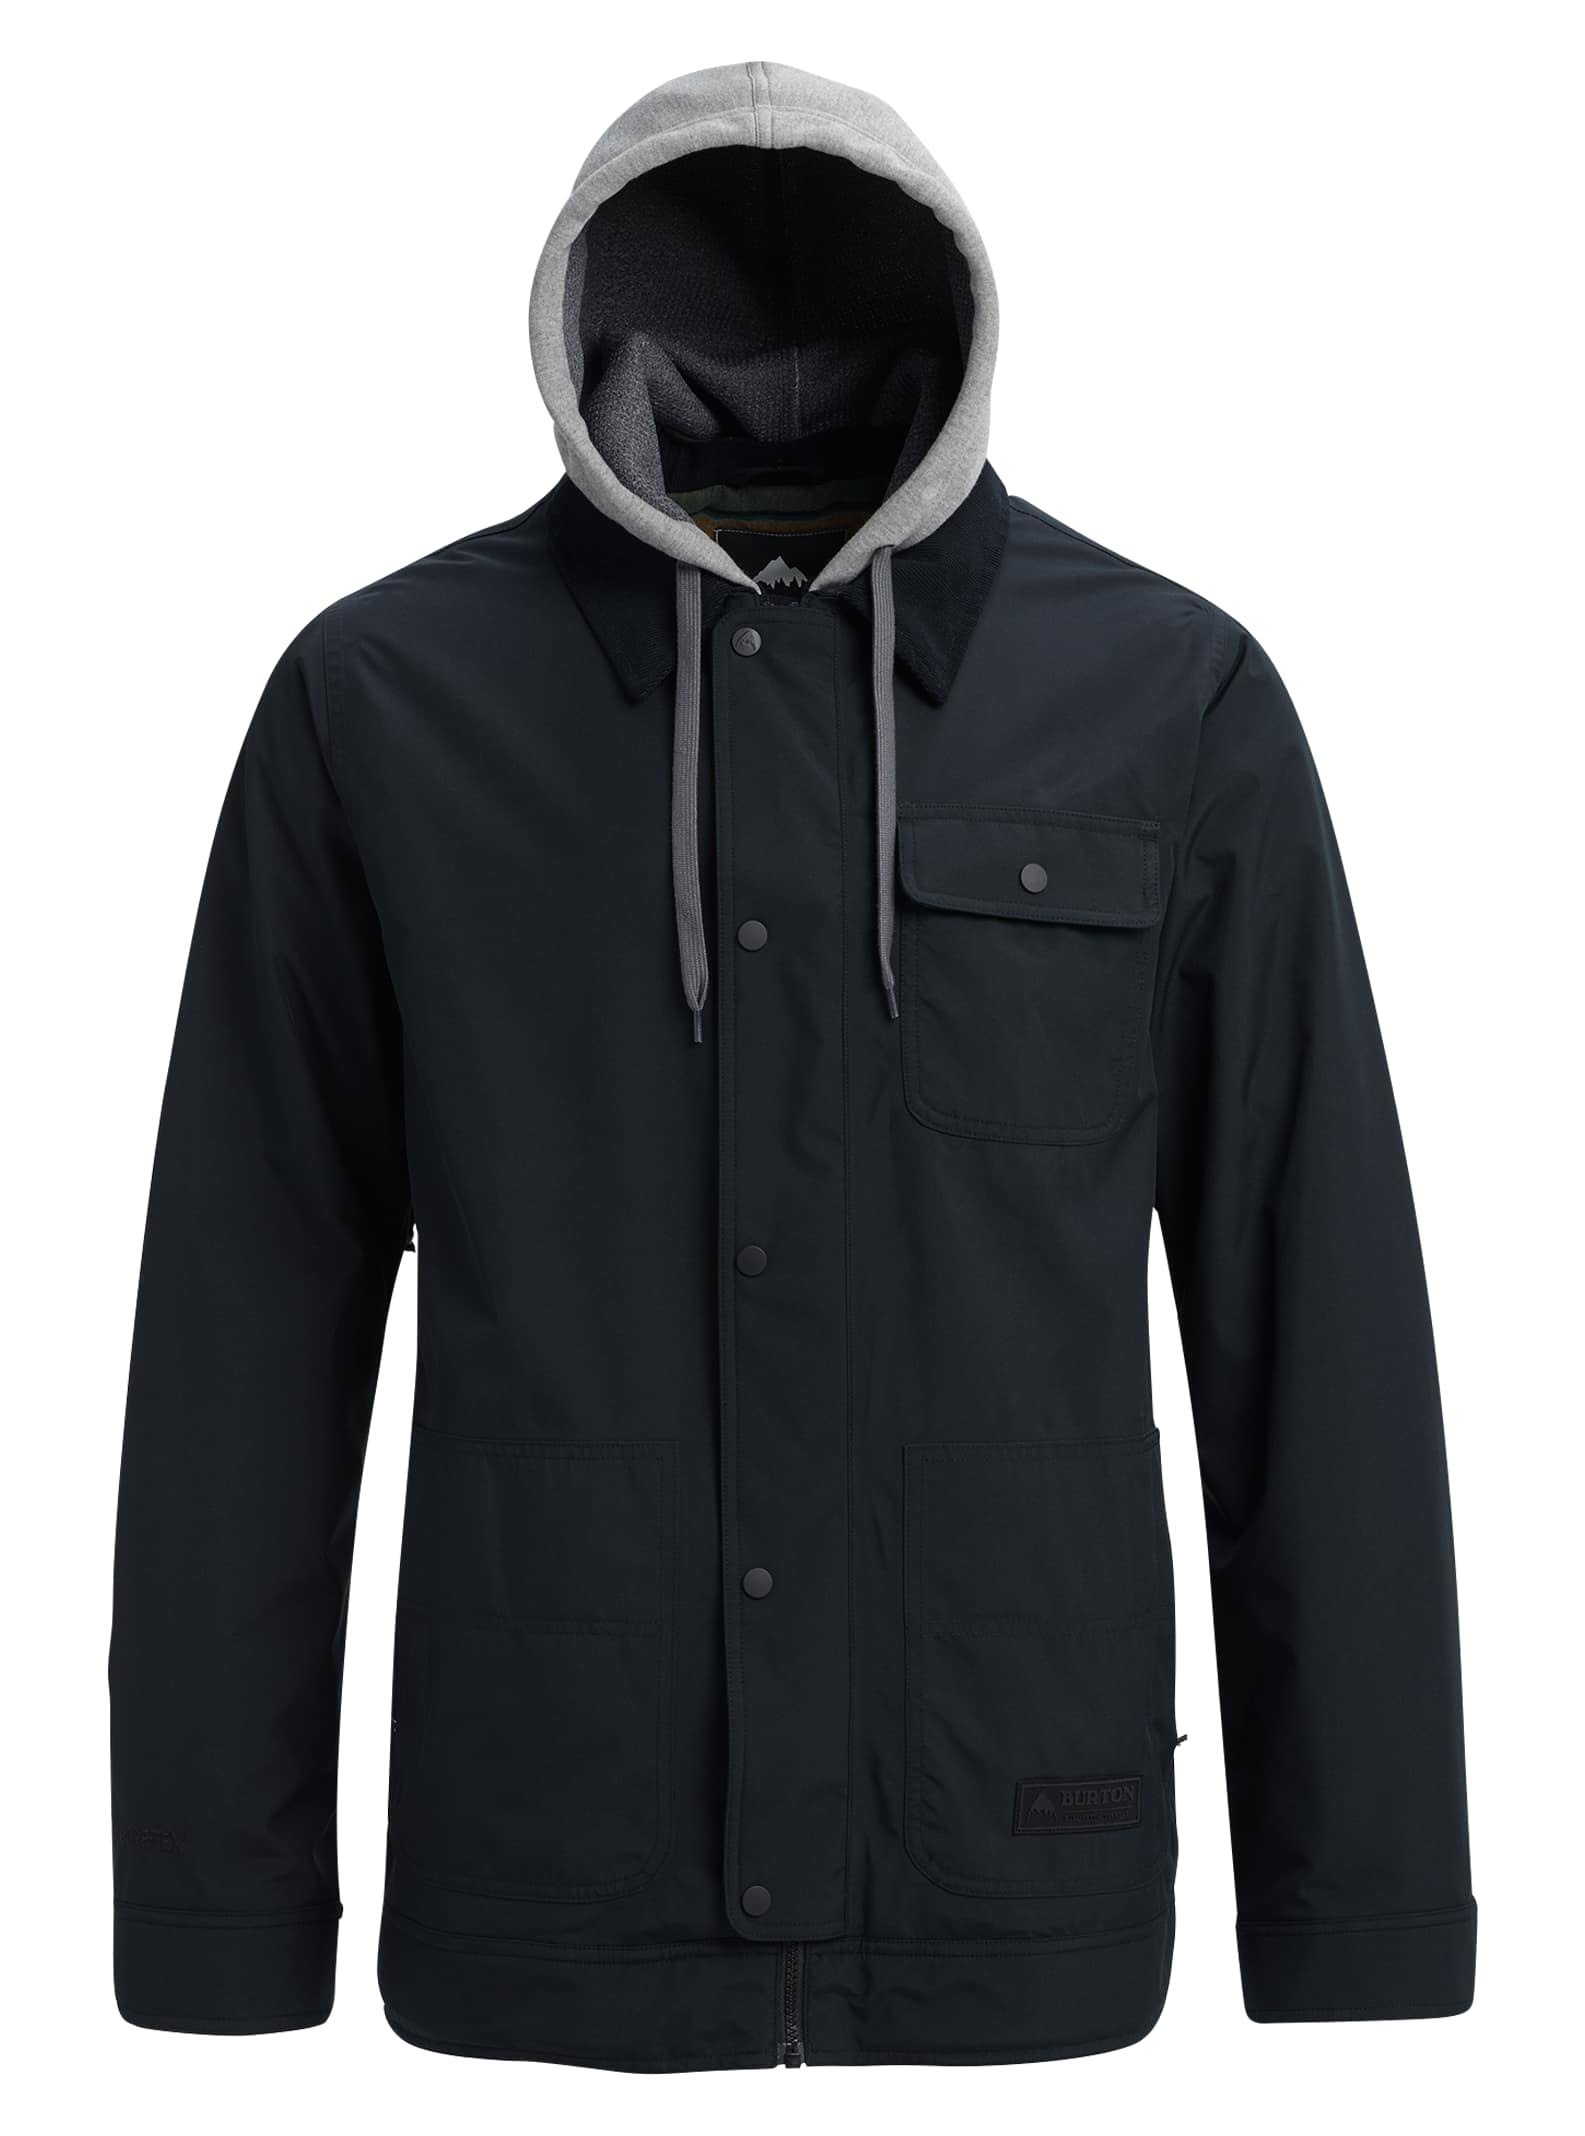 tex Herren Gore Jacket Burton Black Dunmore 20550100001s True Small qaPA7nw5